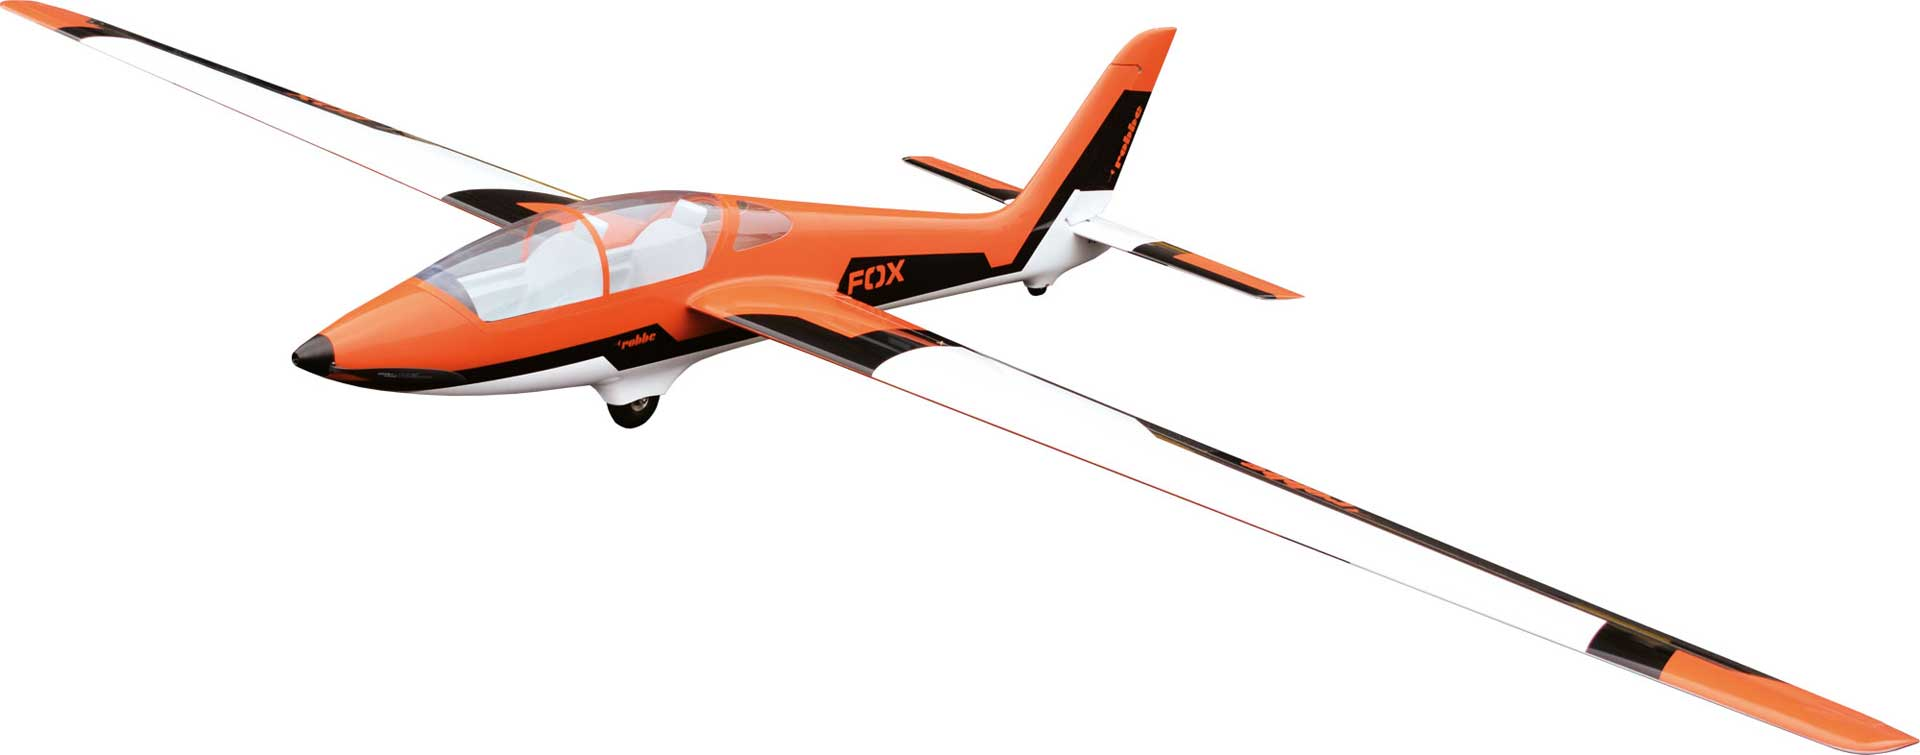 Robbe Modellsport MDM-1 FOX 3,5M SEGLER ARF VOLL GFK/CFK LACKIERT ORANGE KUNSTFLUG SEGELFLUGZEUG